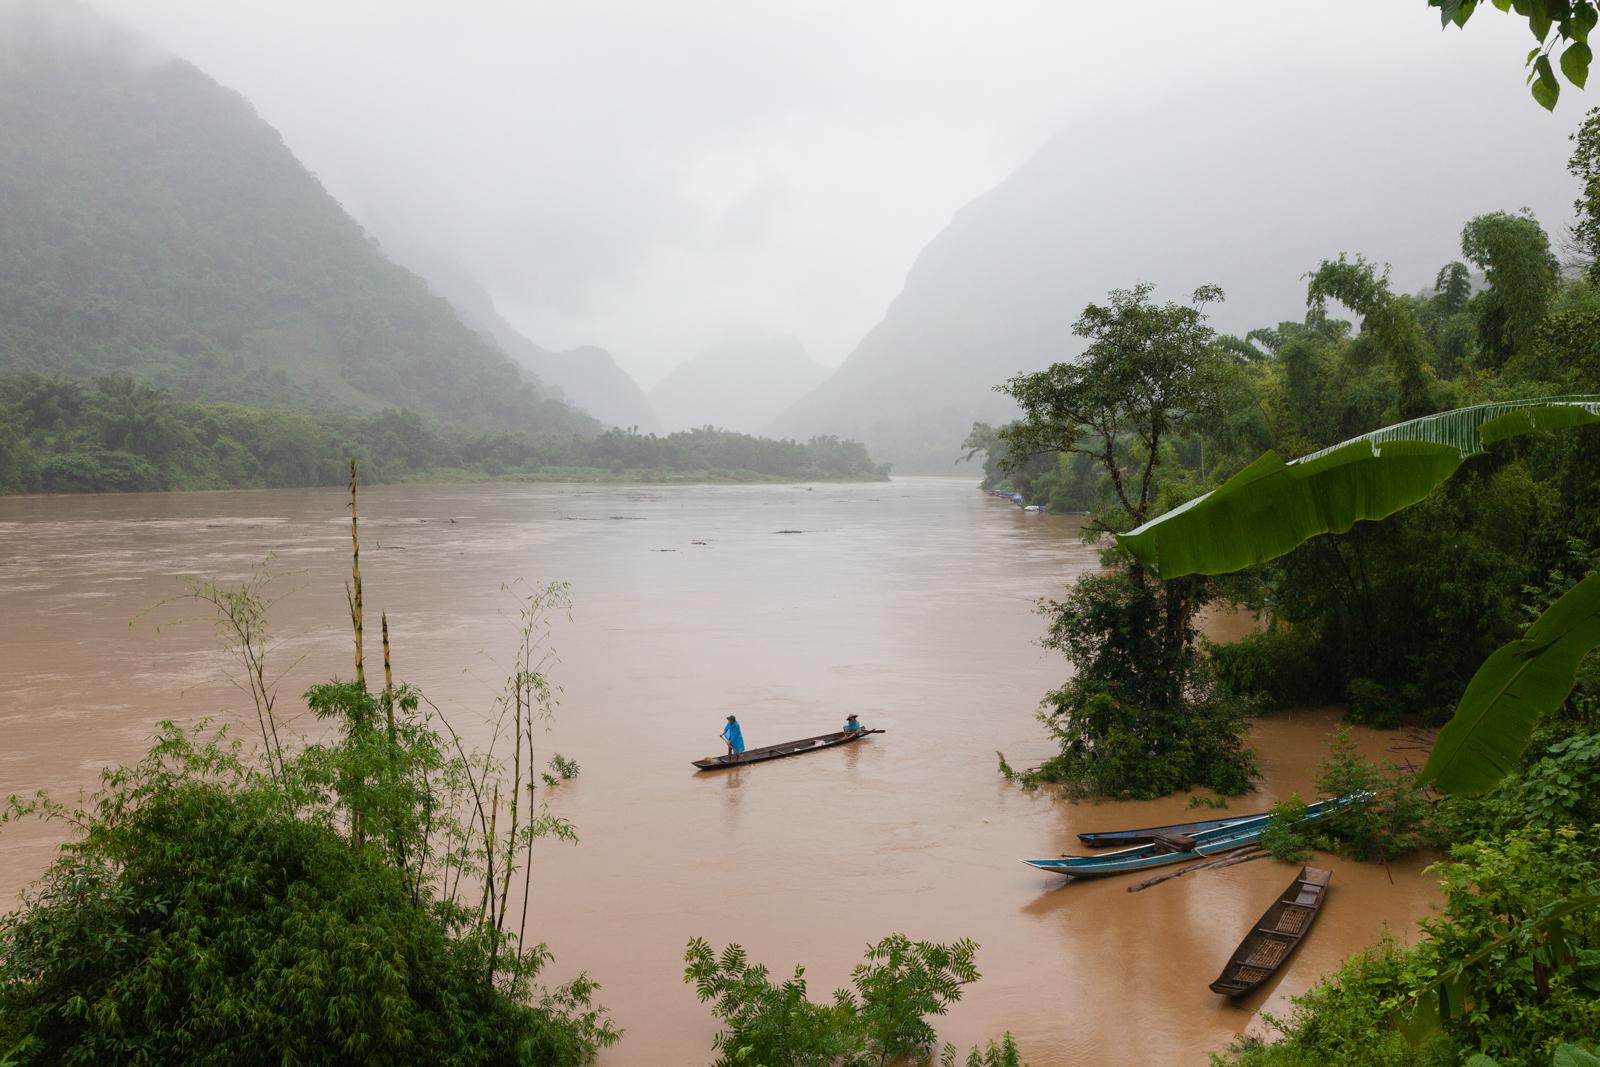 Nam Ou River. Credit: Andy Isaacson